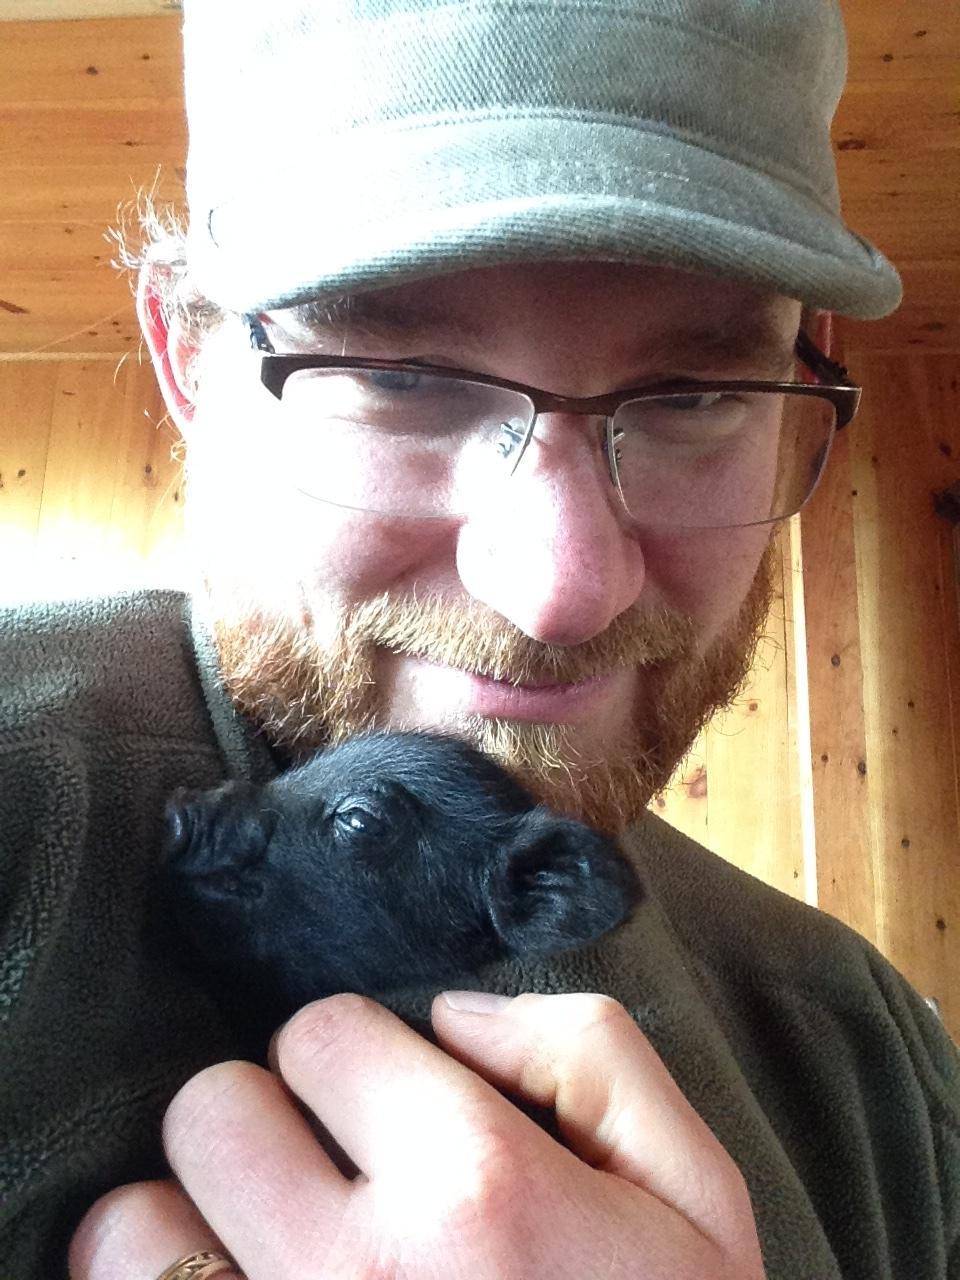 Greg cuddling a piglet